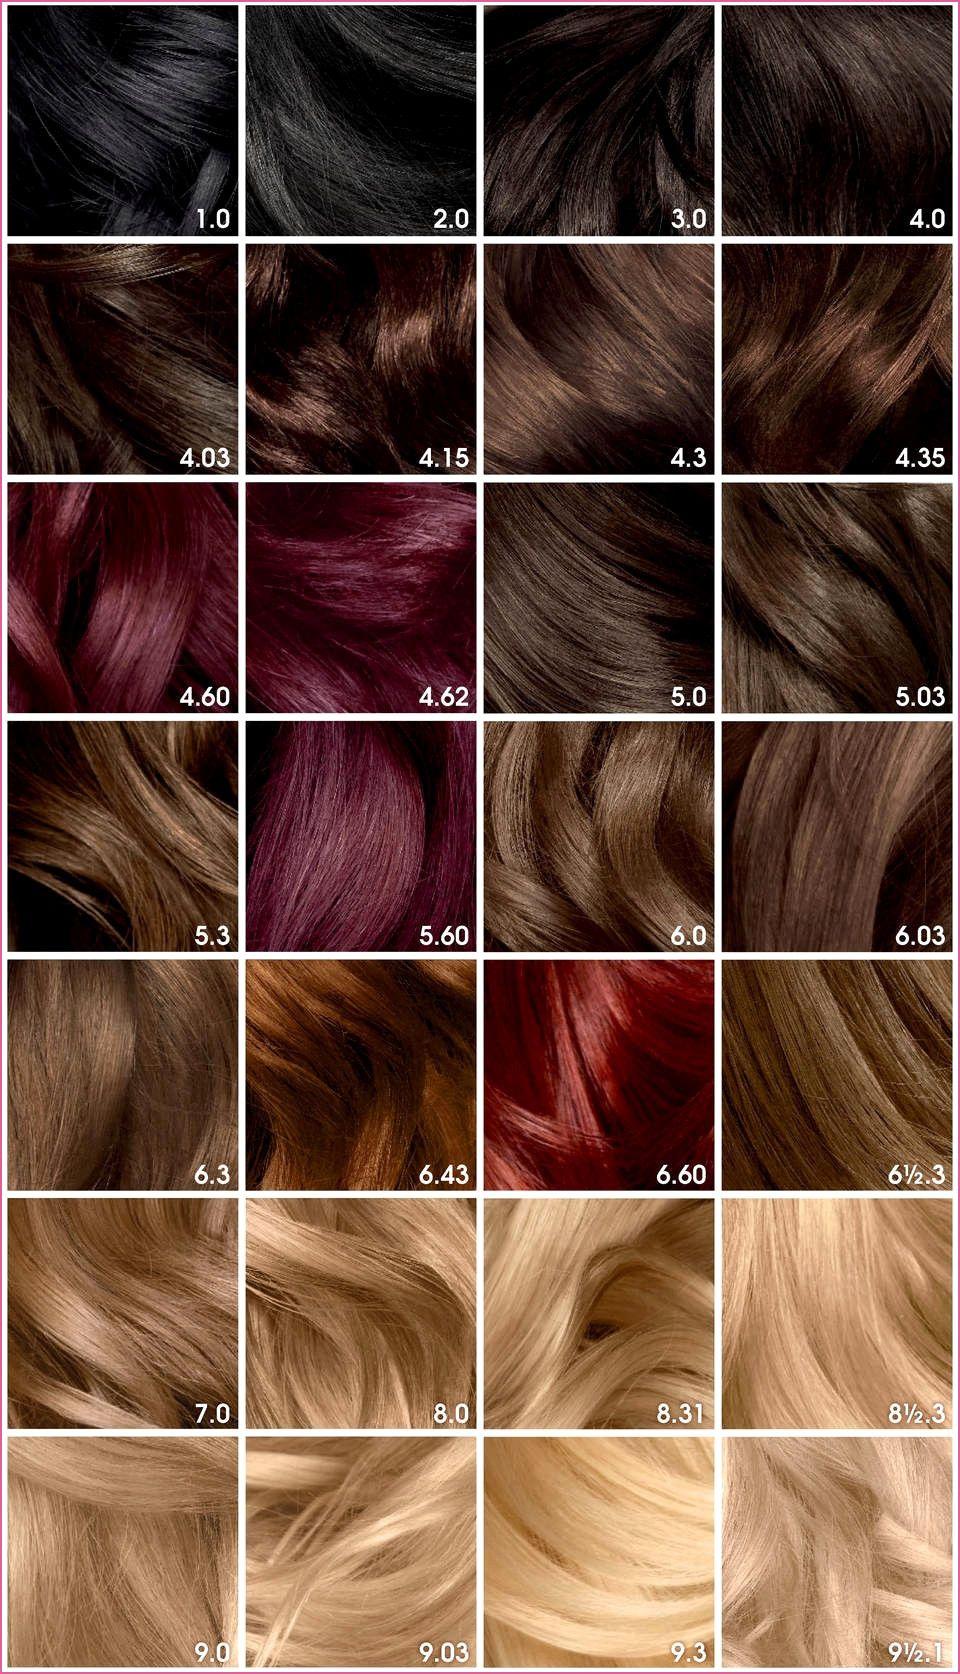 Burgundy Brown Hair Color Olia Hair Color Garnier Hair Color Hair Color Chart